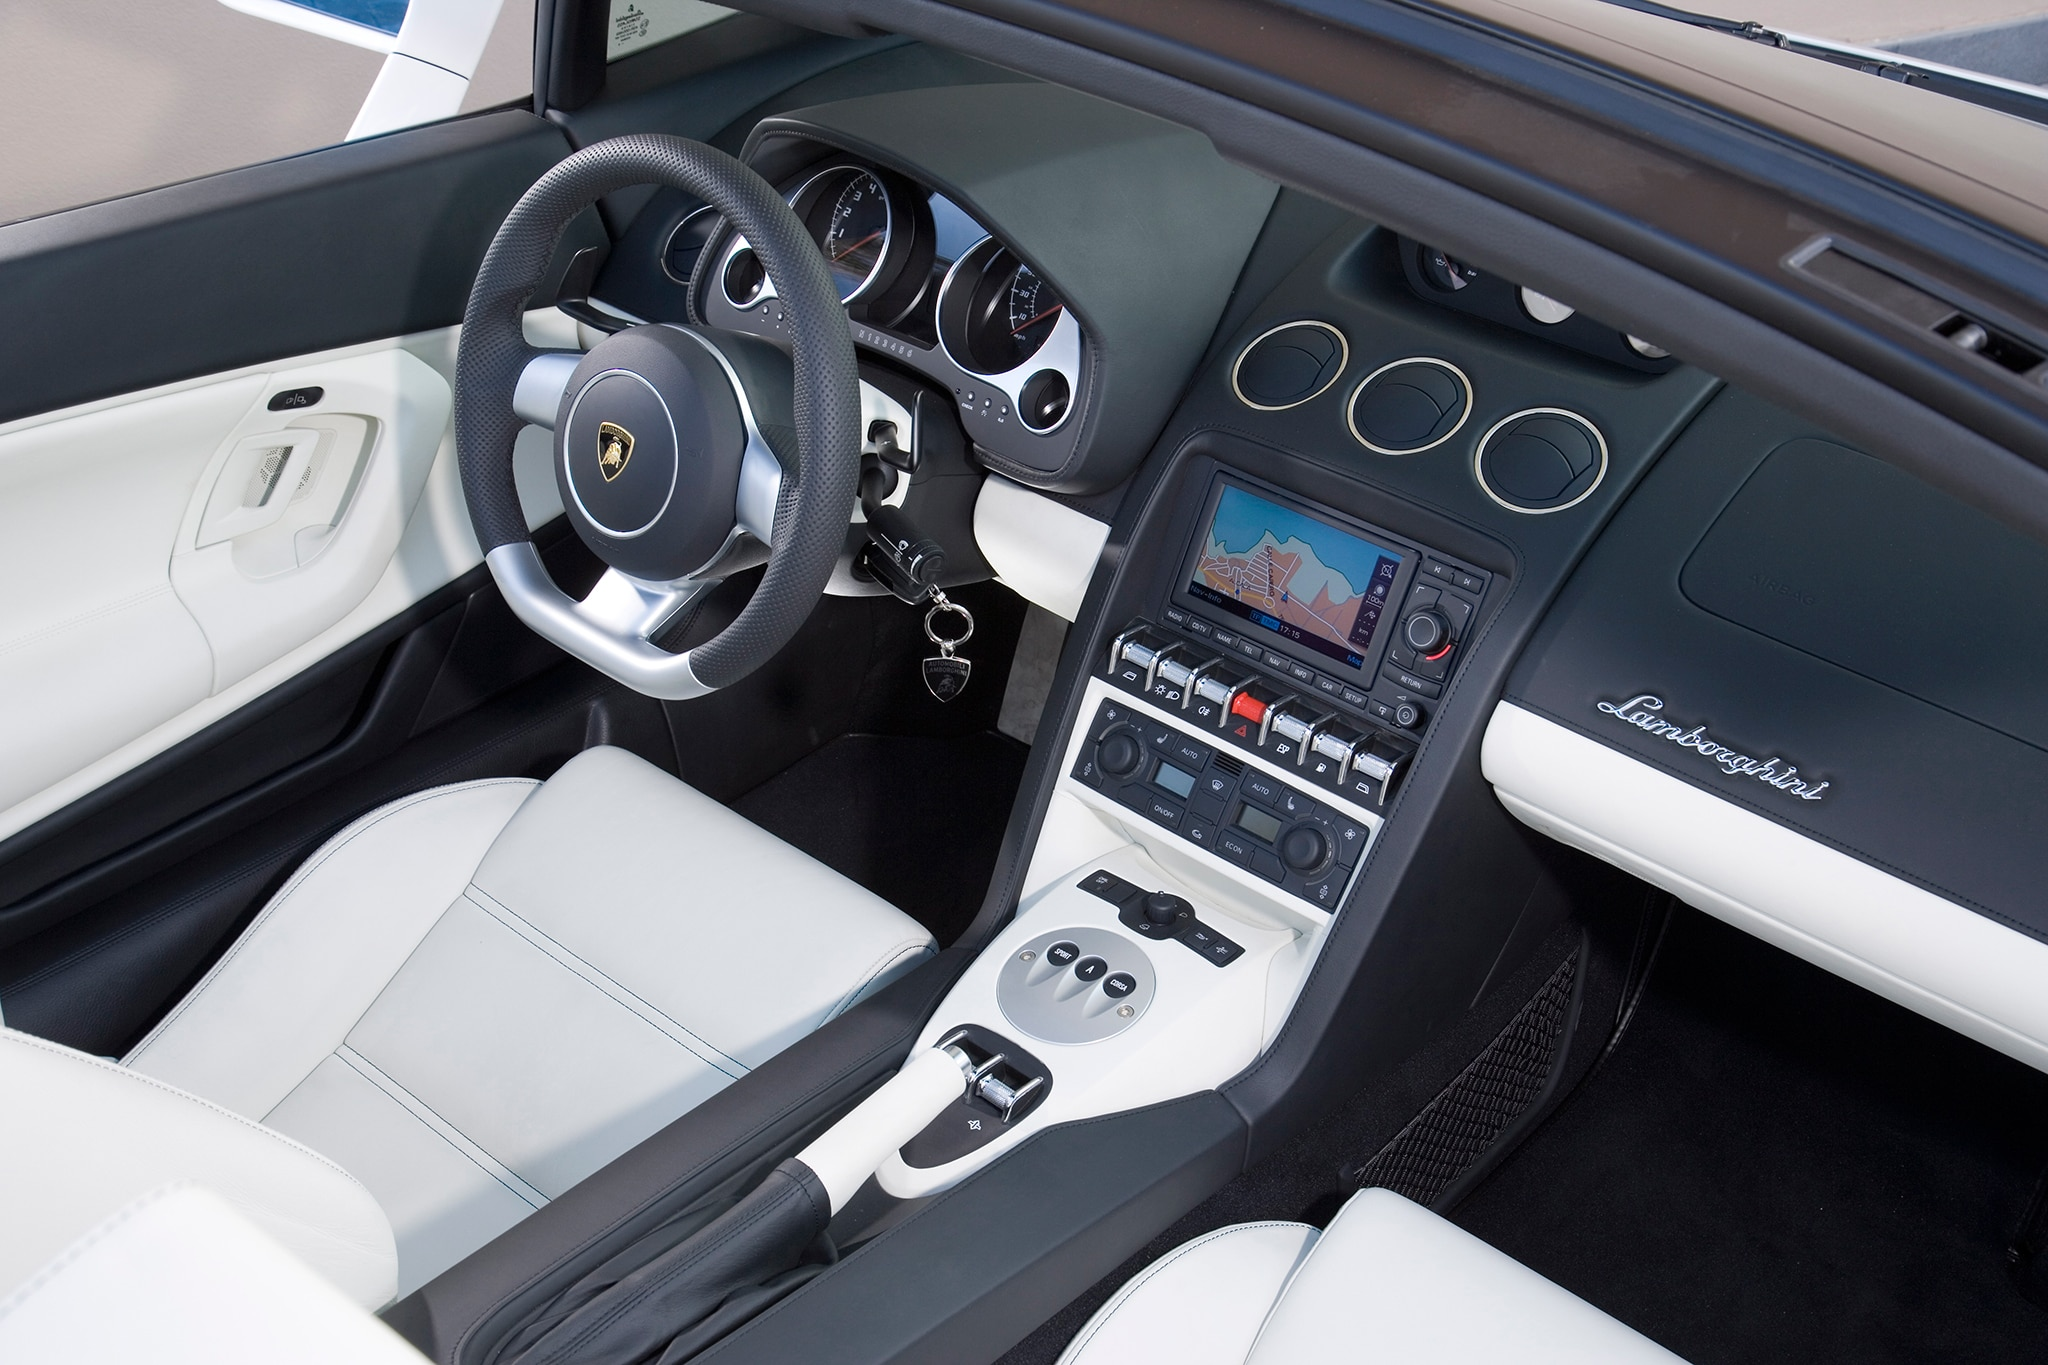 2014 Lamborghini Gallardo LP 560 4 Spyder. 14|95 · 2014 Lamborghini Gallardo  ...